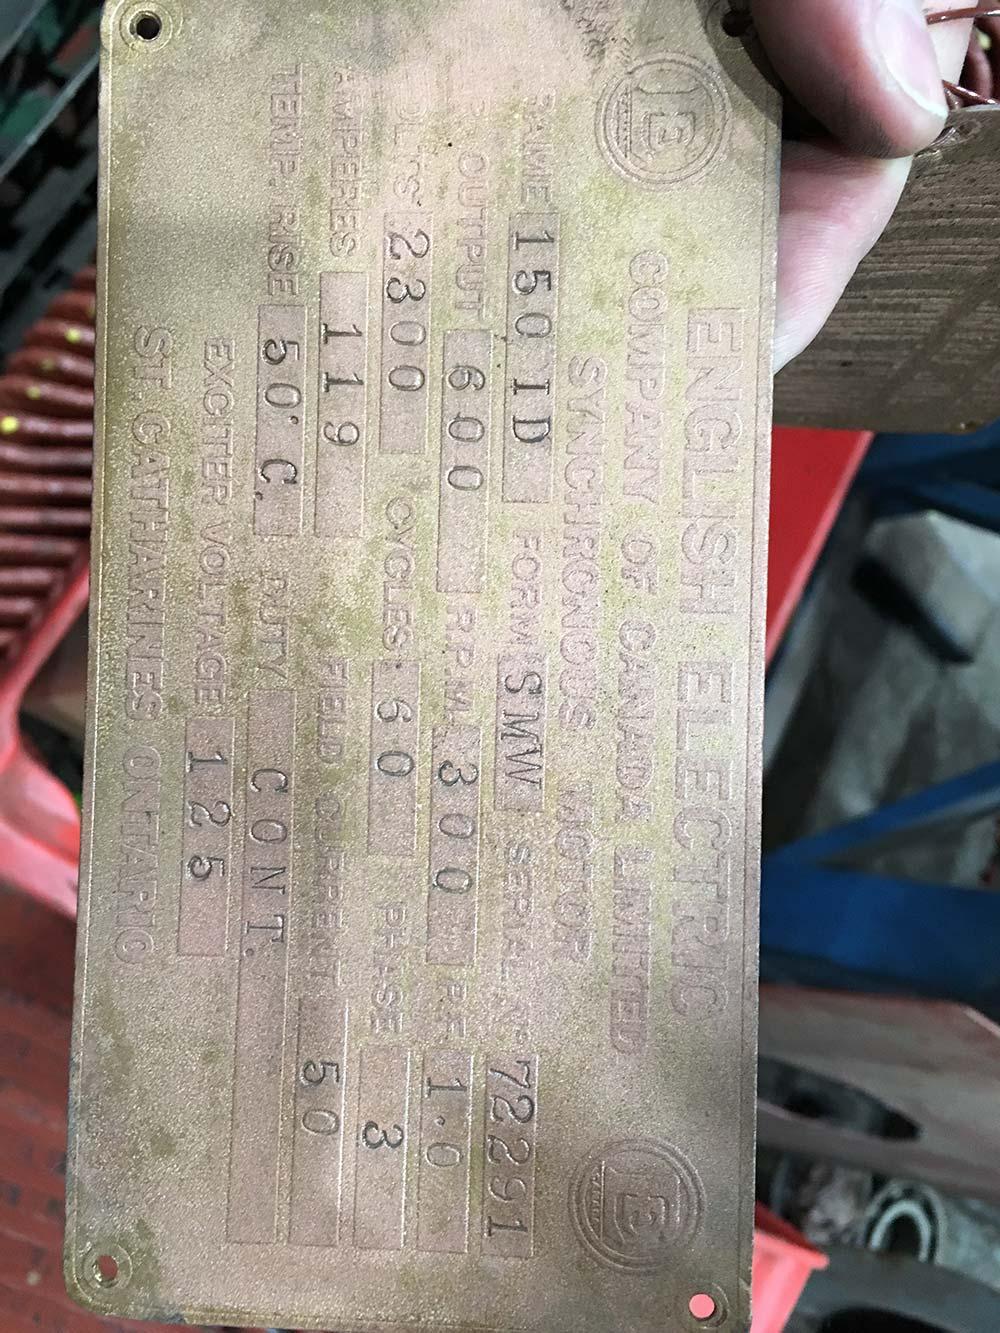 English Electric compressor motor nameplate closeup